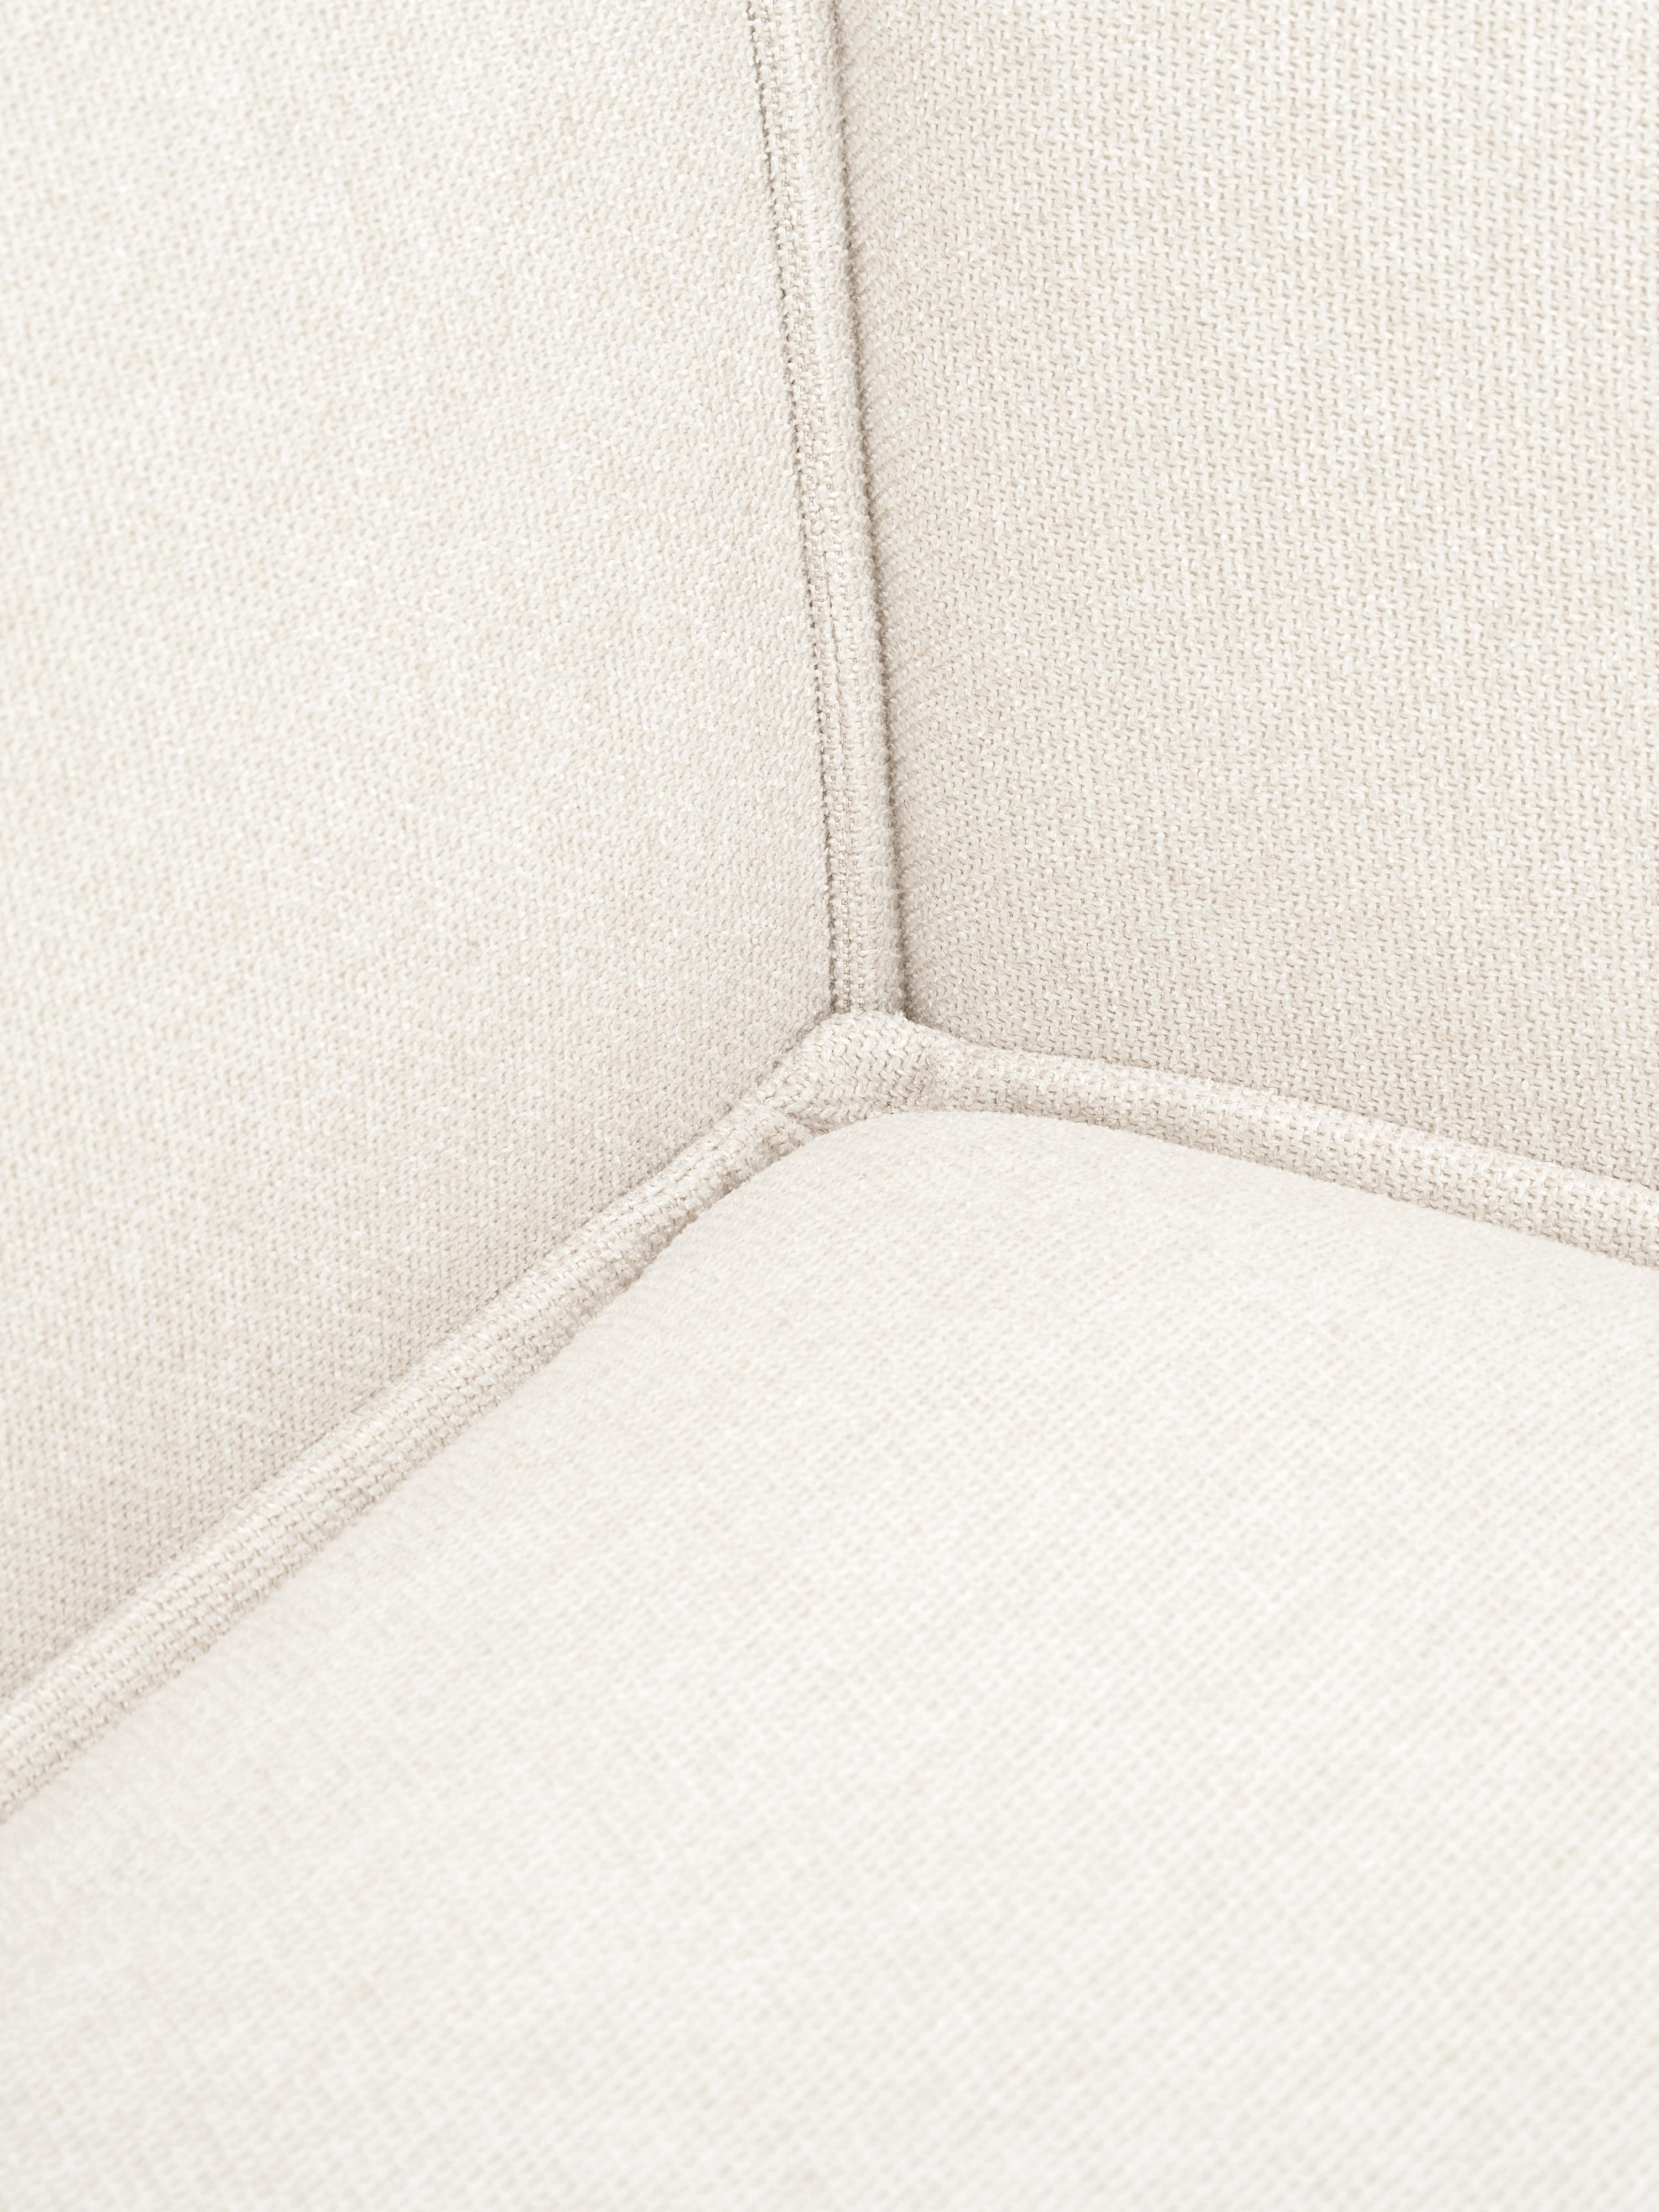 Sofá modular Lennon (3plazas), Tapizado: poliéster Alta resistenci, Estructura: madera de pino maciza, ma, Patas: plástico, Tejido beige, An 242 x F 121 cm